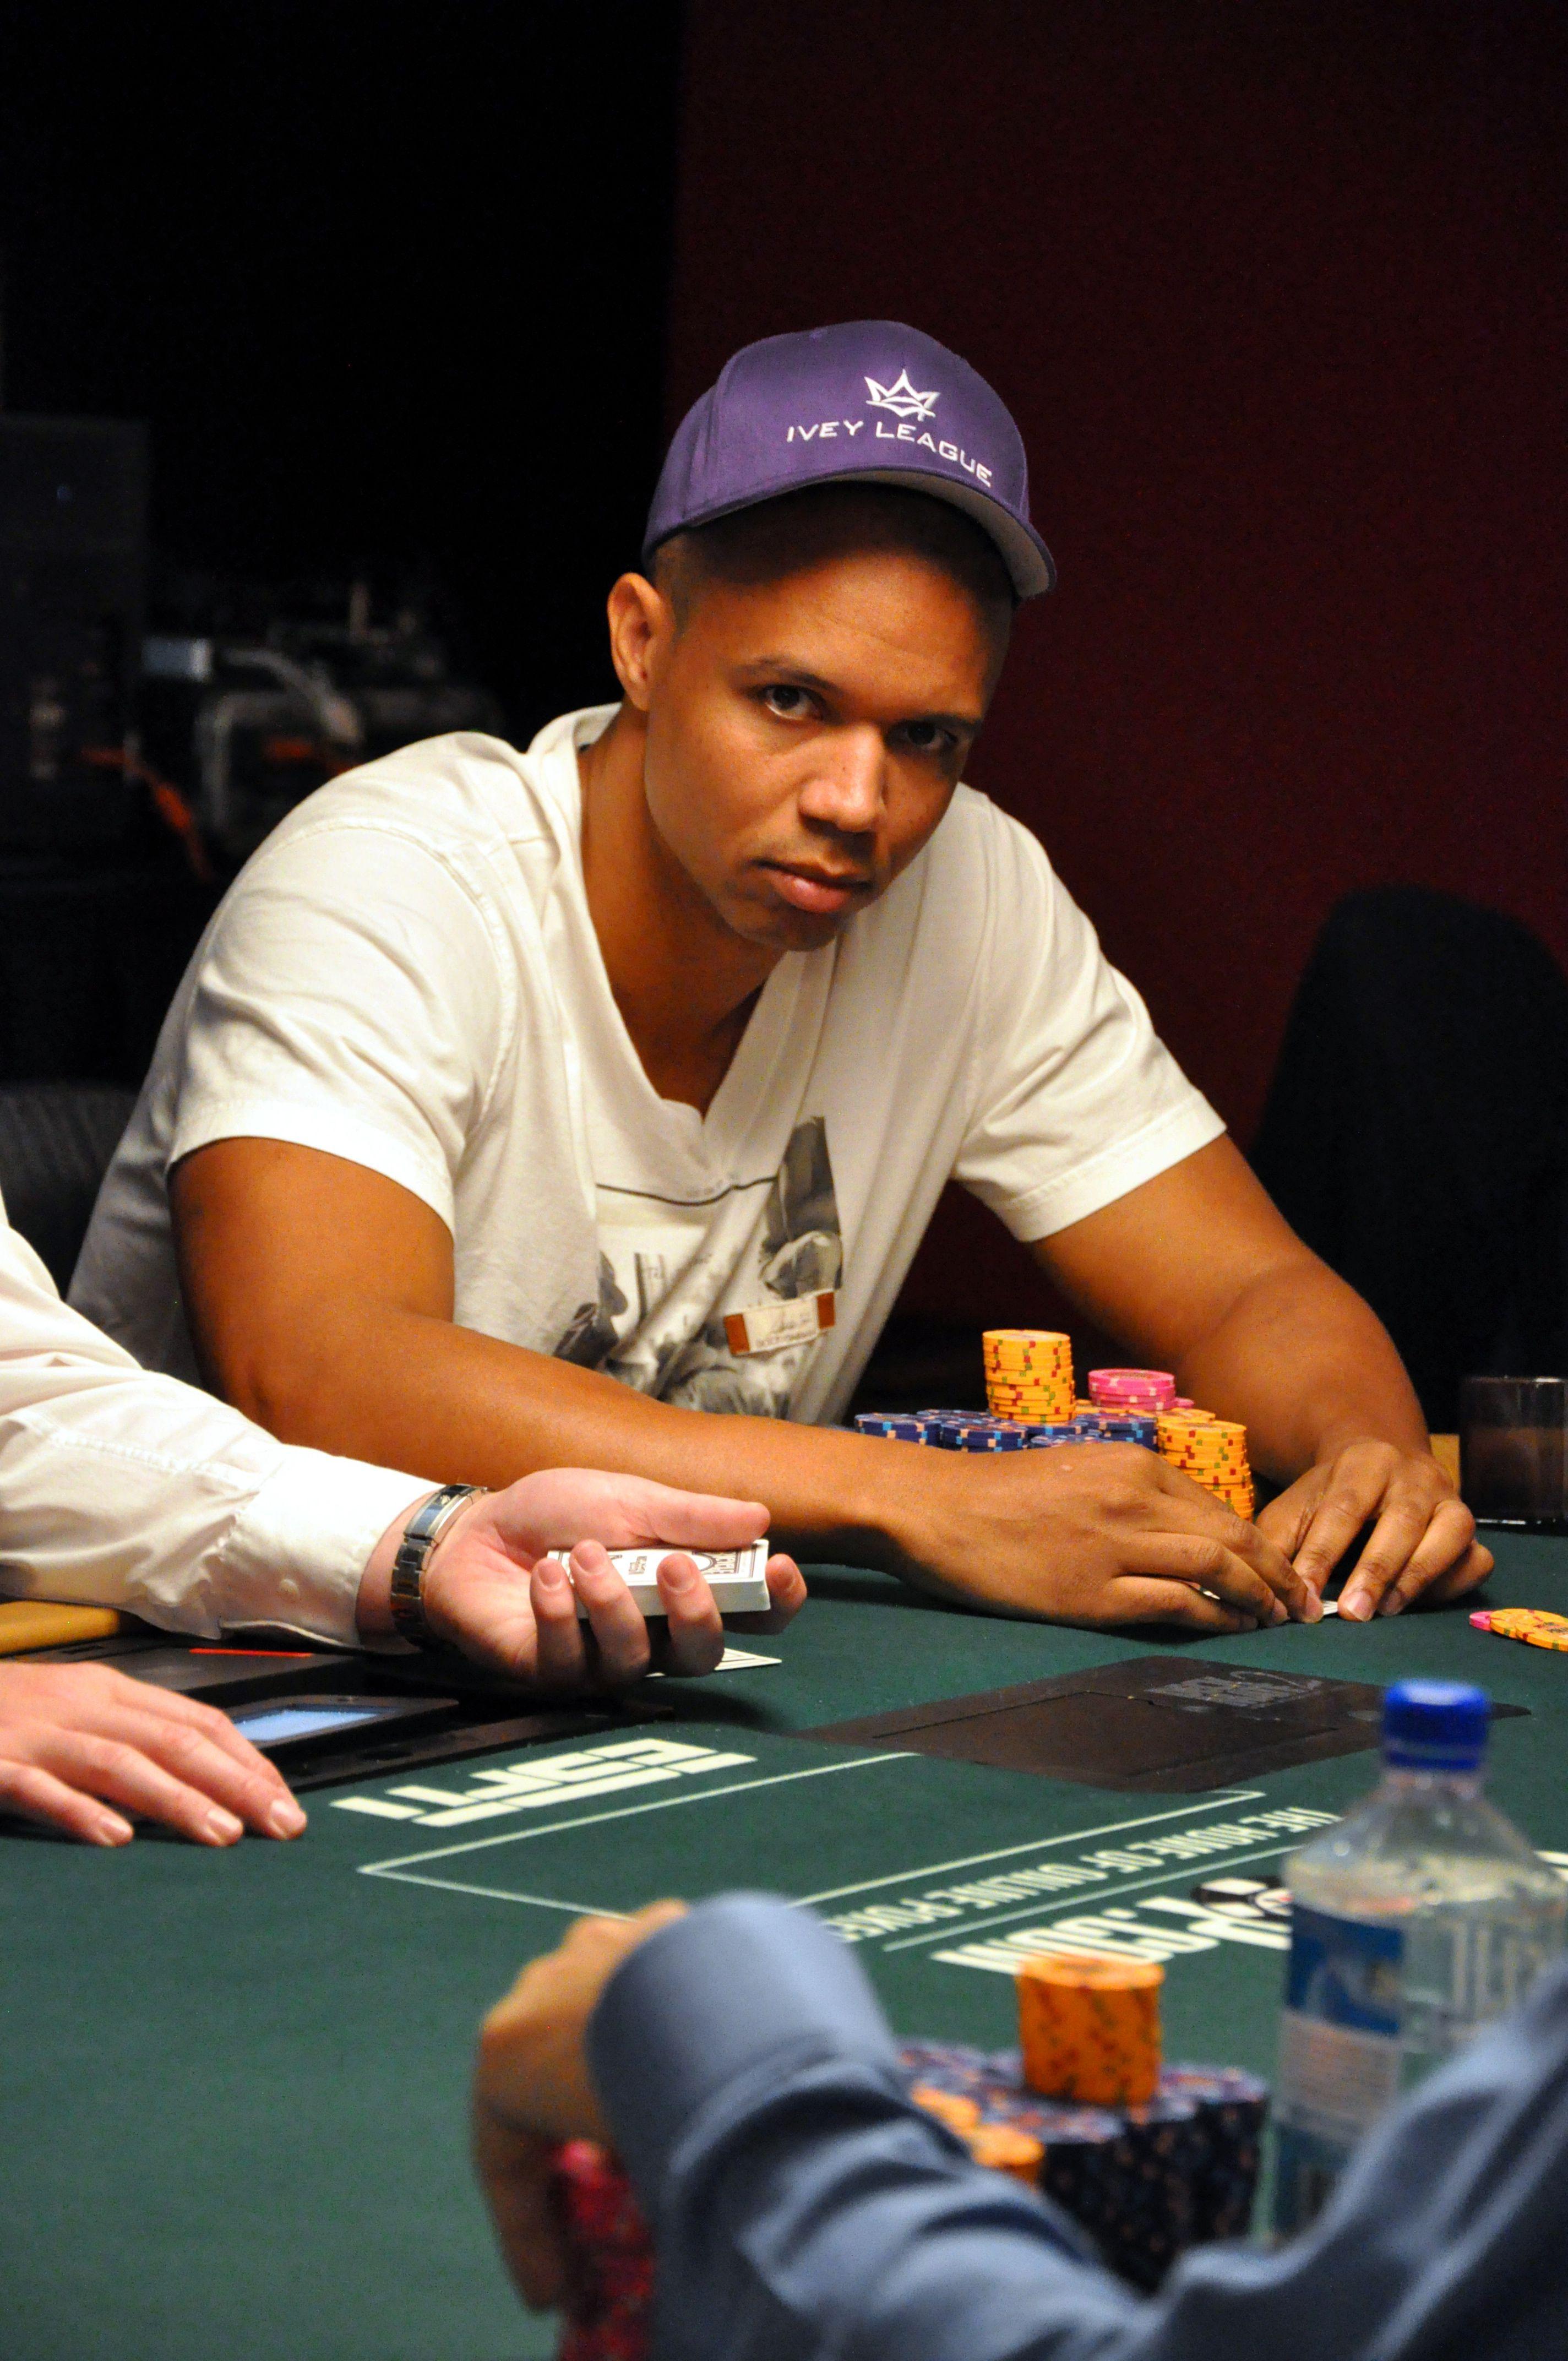 Phil Ivey WSOP Winamax Poker World series of poker